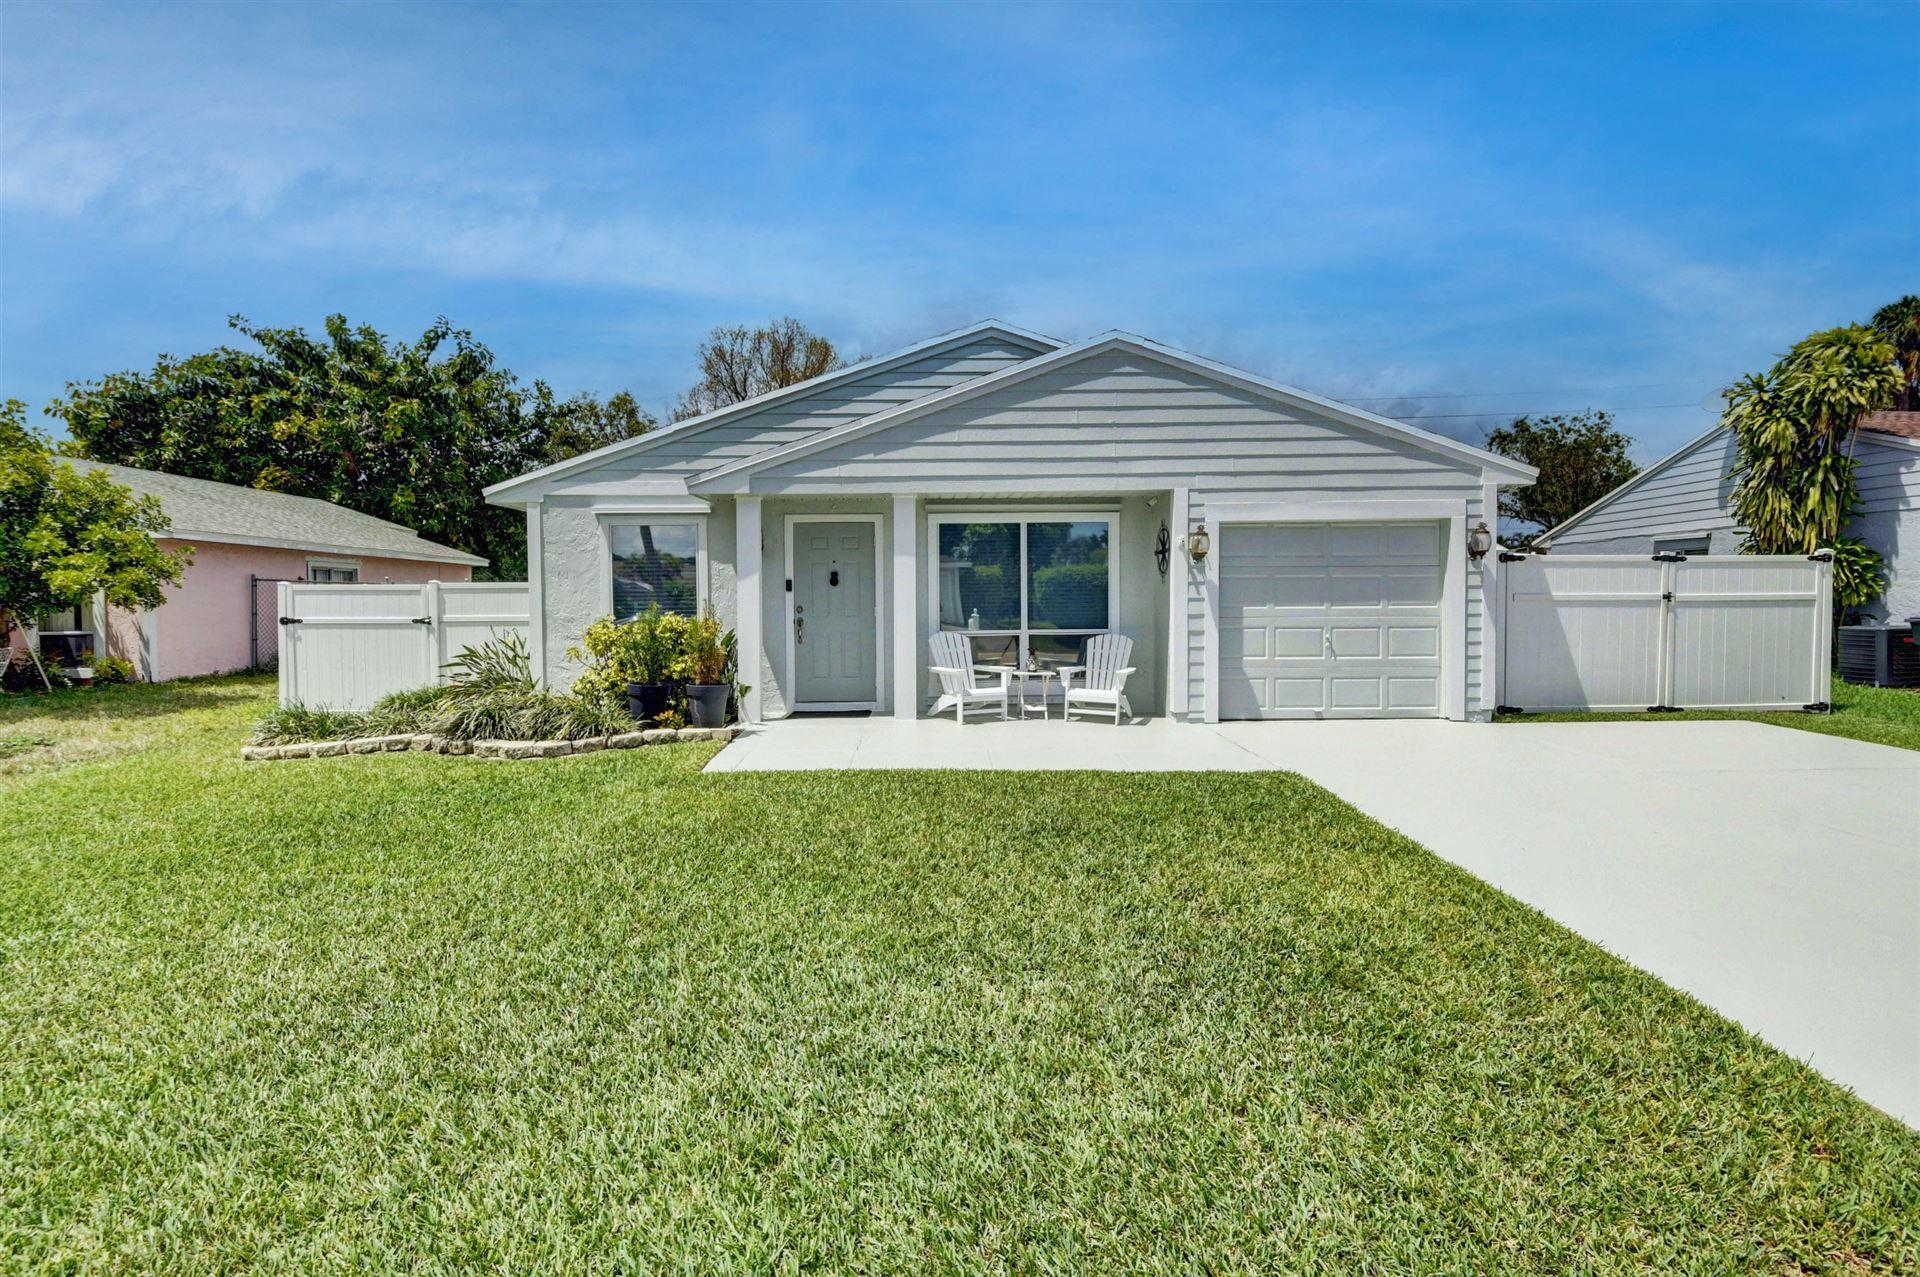 8379 Garden Gate Place, Boca Raton, FL 33433 - MLS#: RX-10712998